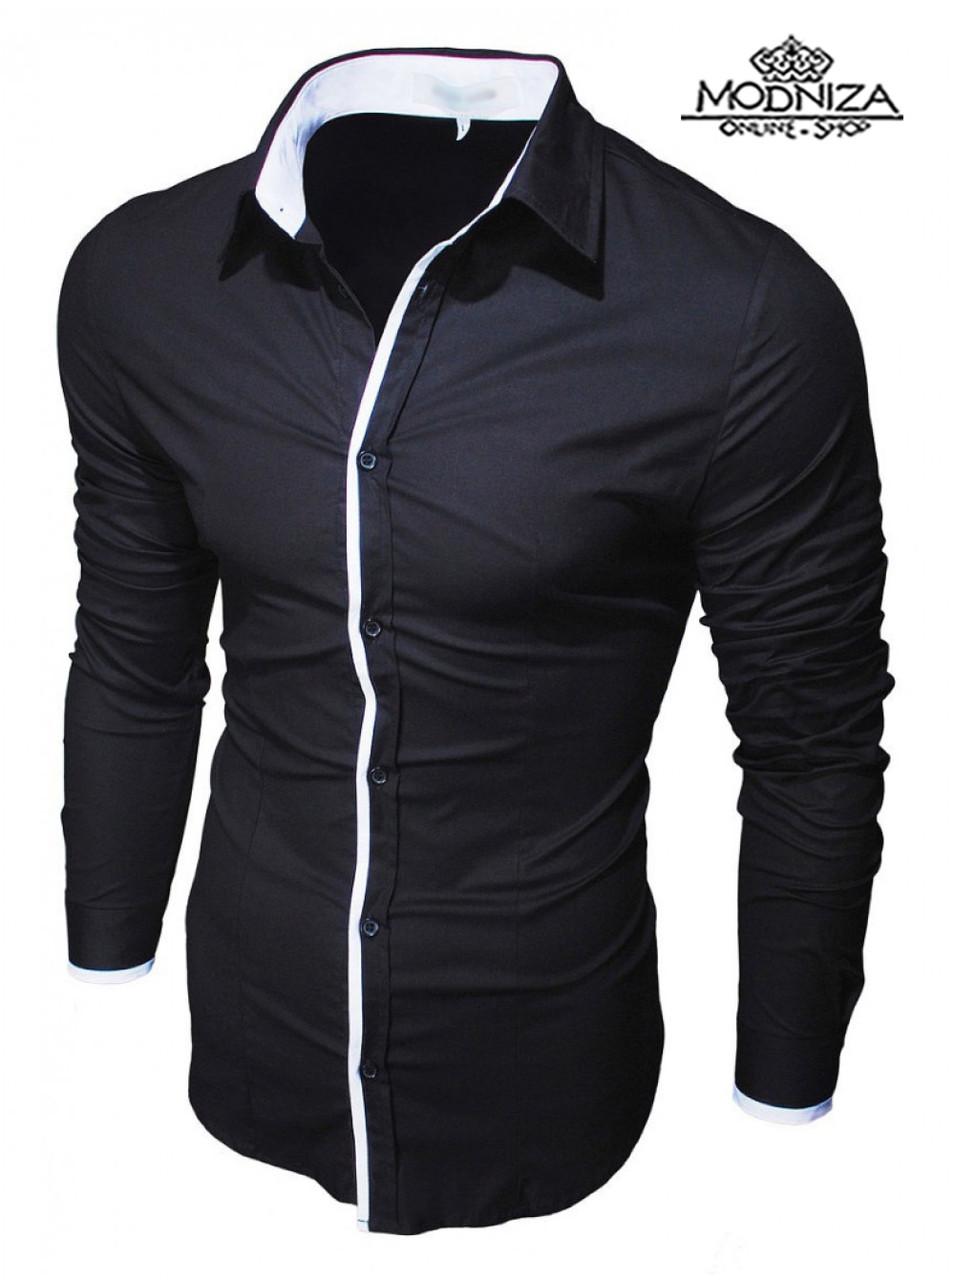 Чоловіча стильна чорна сорочка